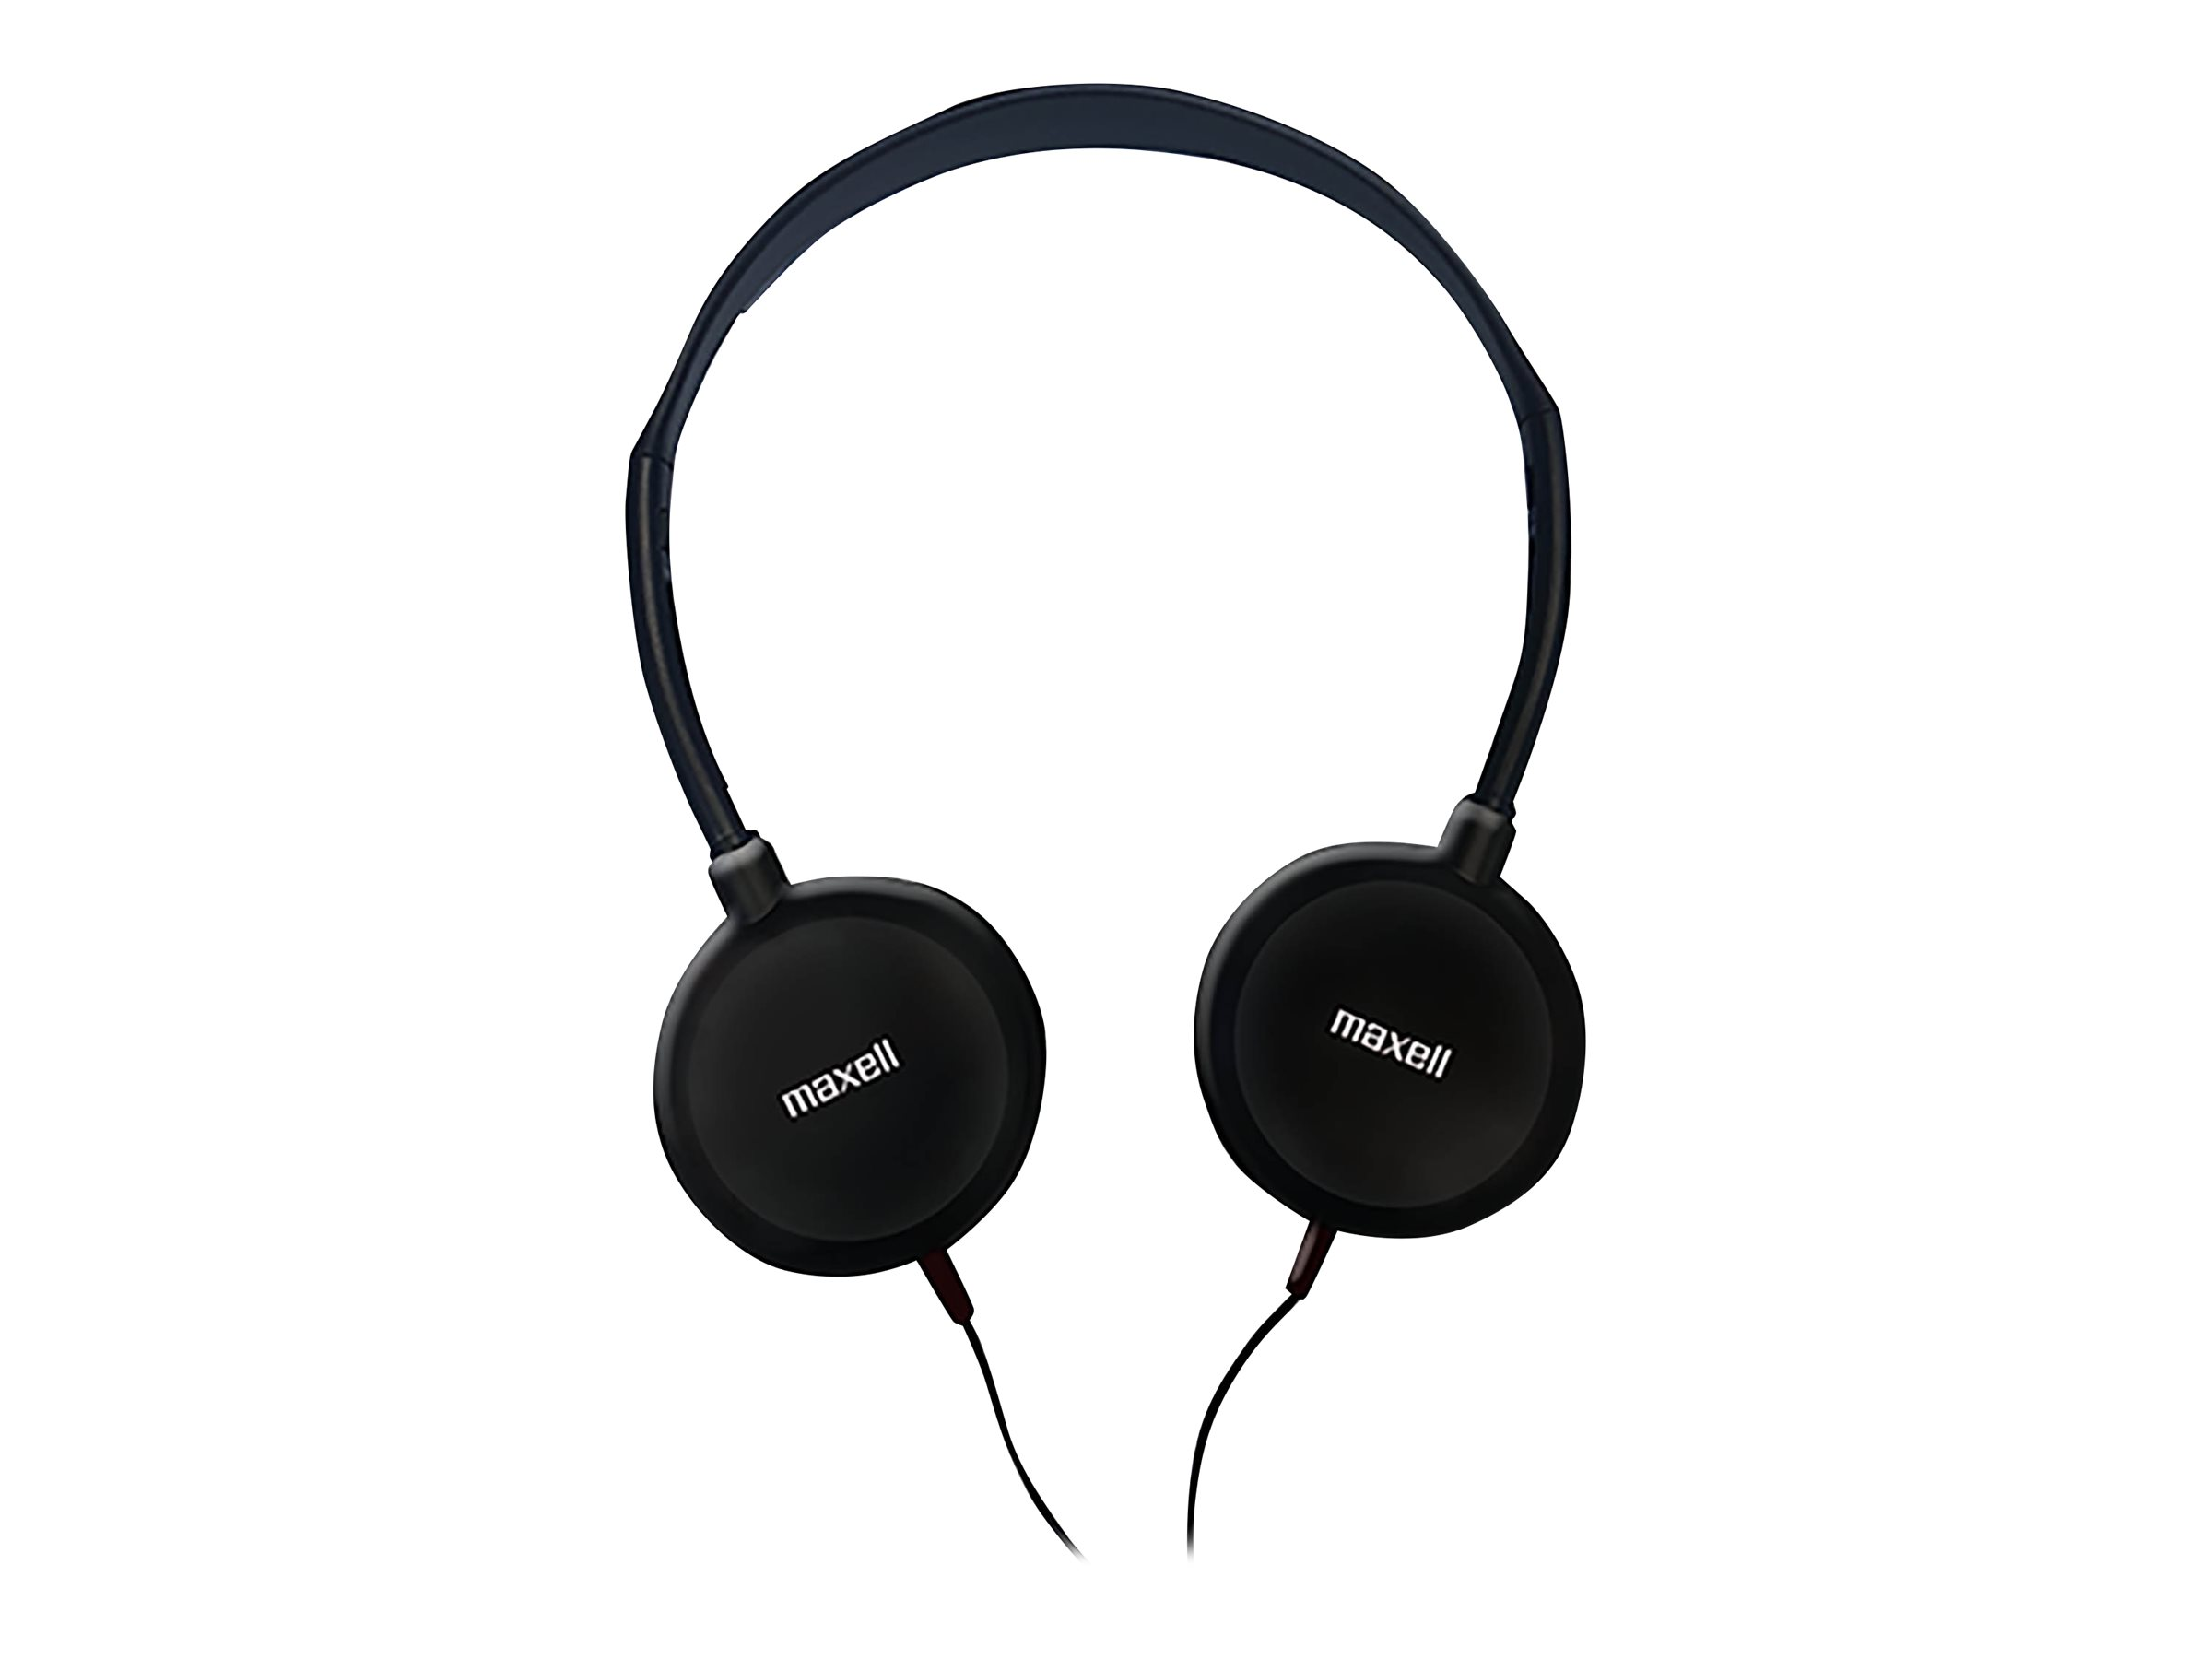 Maxell HP 200 - headphones